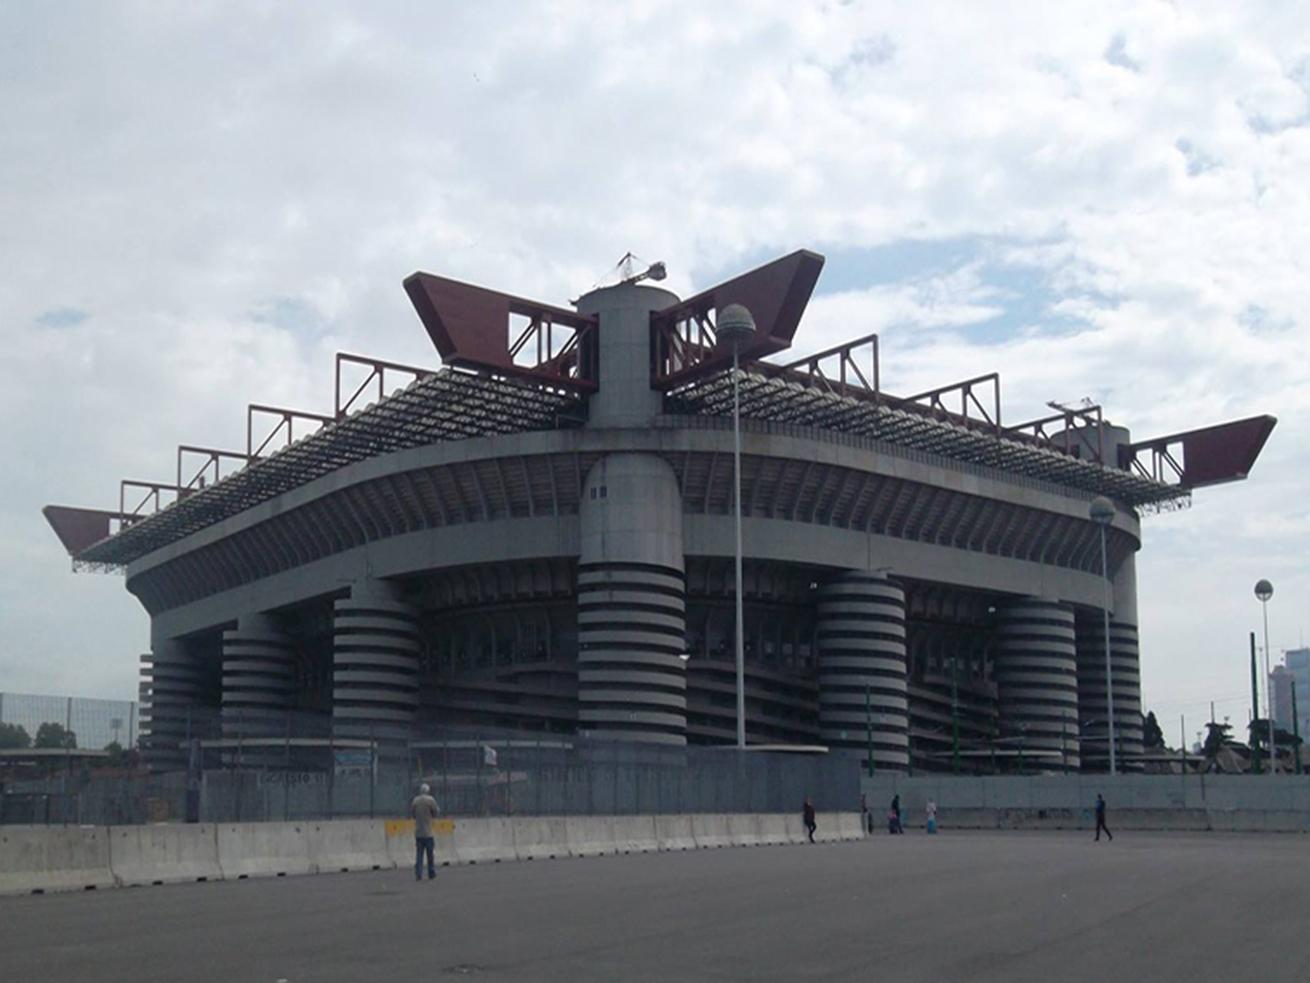 san siro, the san siro, san siro stadium, ac milan stadium, inter milan stadium, tour of san siro, things to see in Milan, things to do in Milan